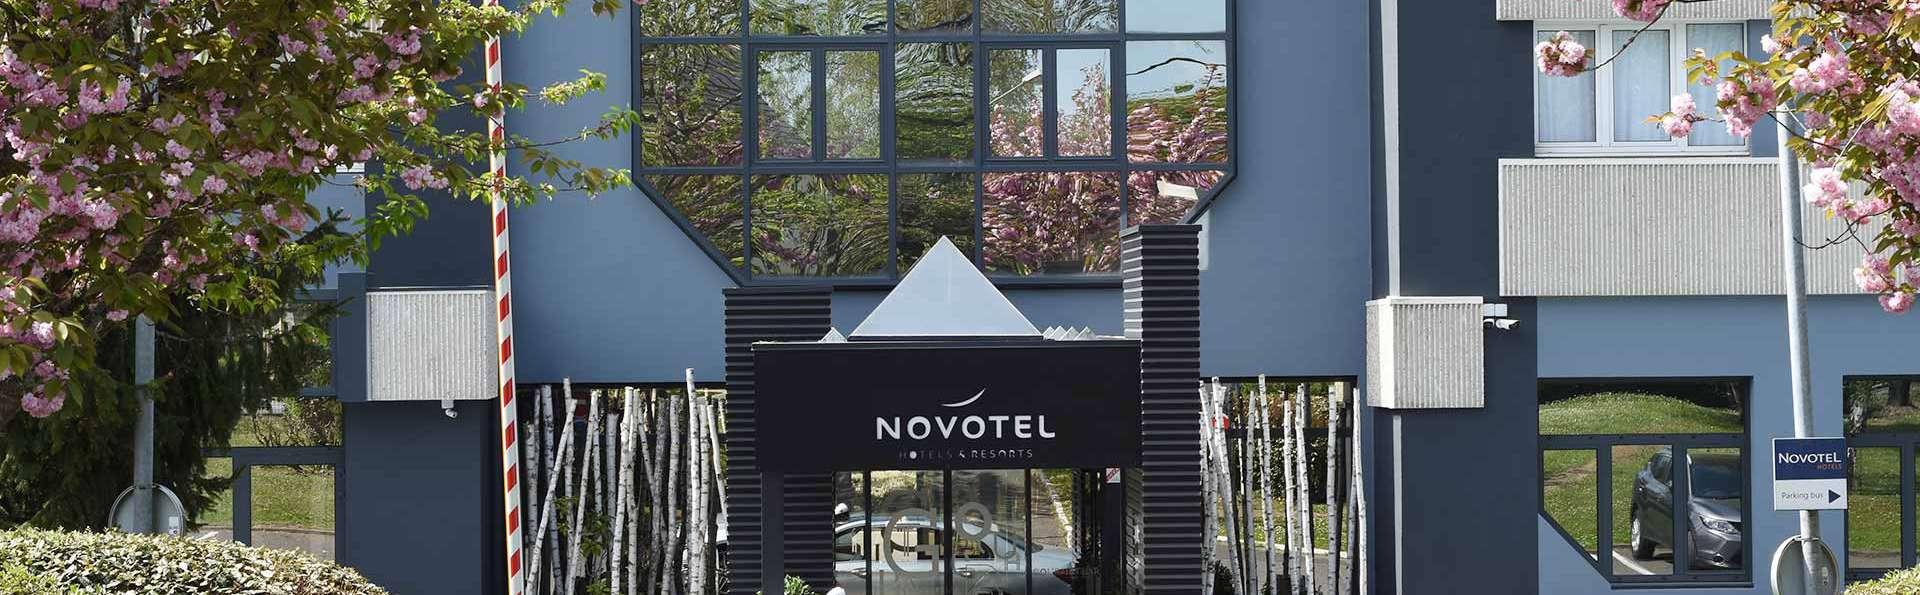 Novotel Orléans Saint-Jean-de-Braye - EDIT_FRONT_01.jpg